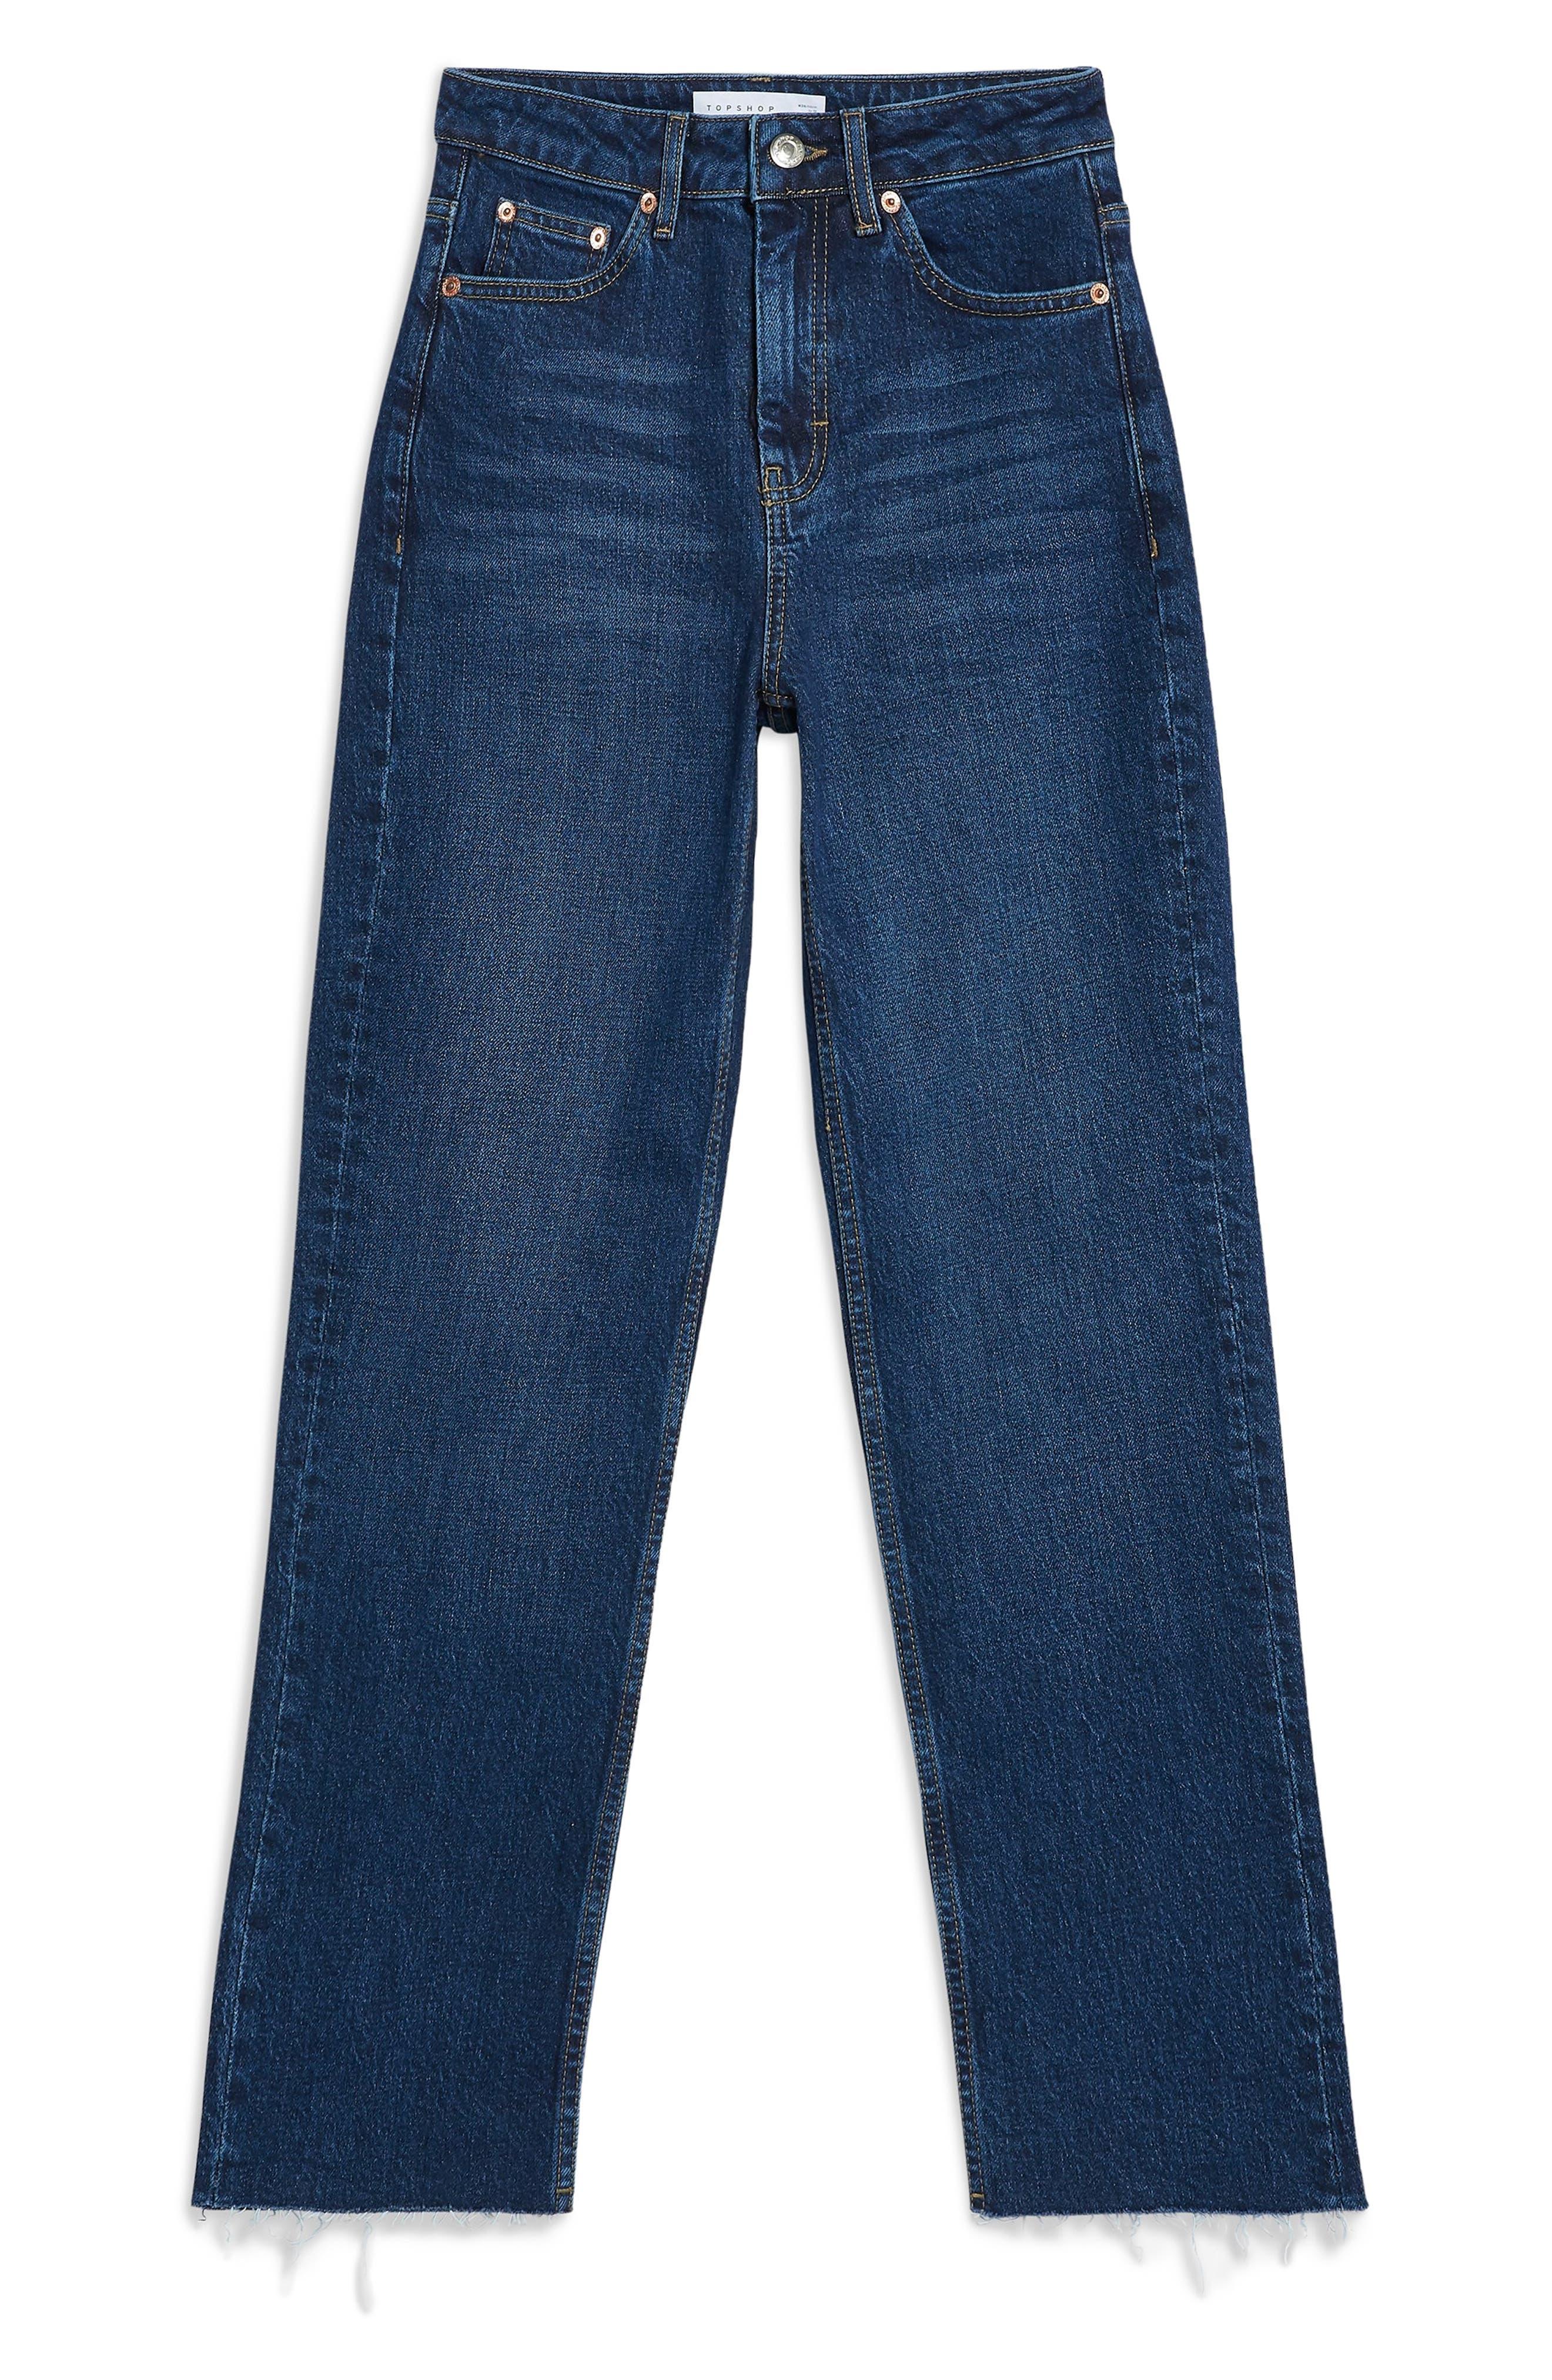 TOPSHOP, Raw Hem Straight Leg Jeans, Alternate thumbnail 4, color, INDIGO